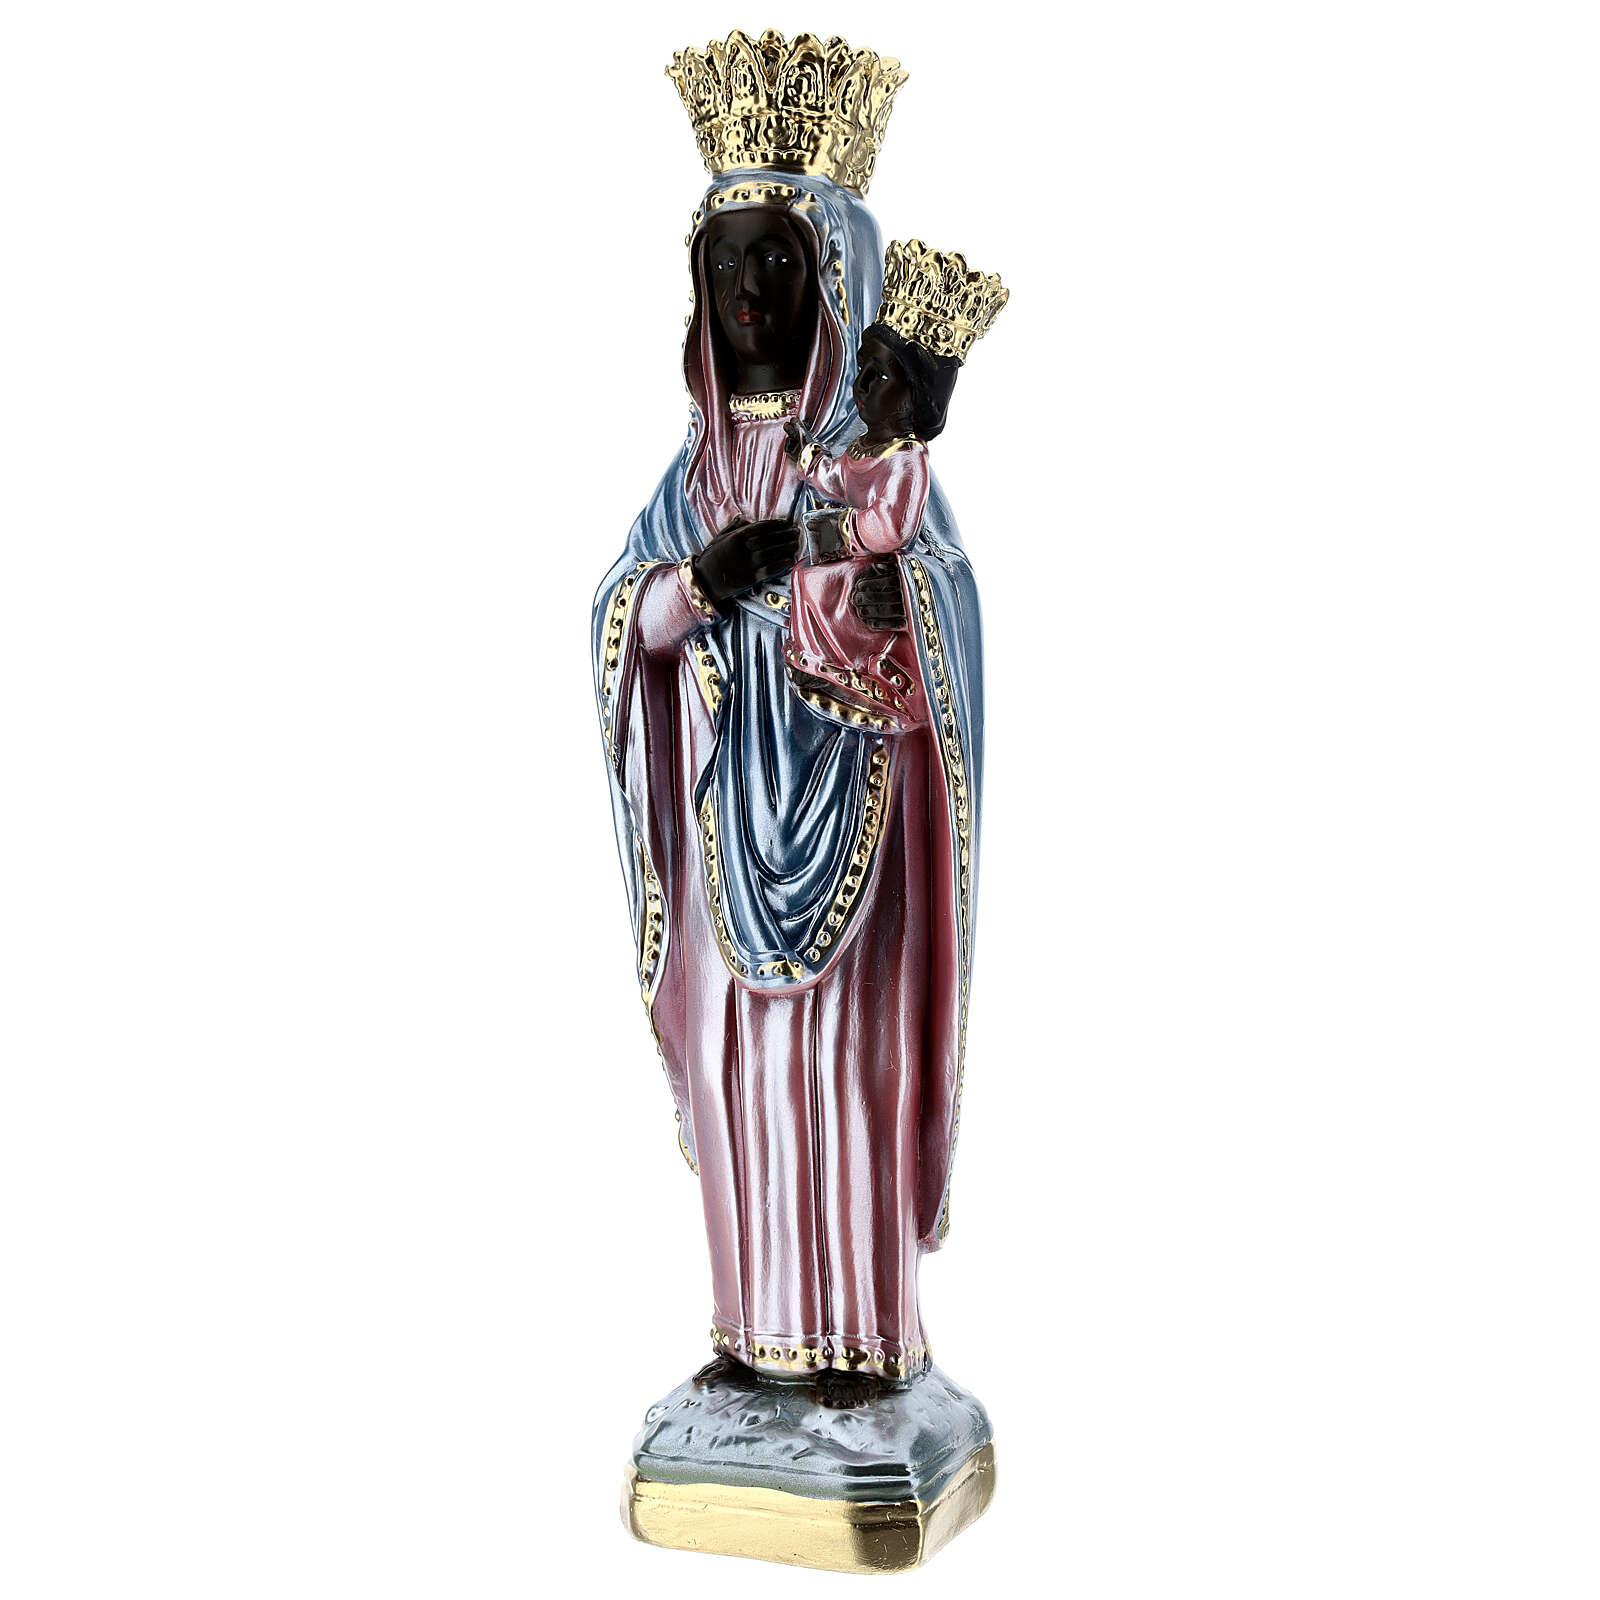 Statua gesso madreperlato Madonna di Czestochowa 35 cm 4